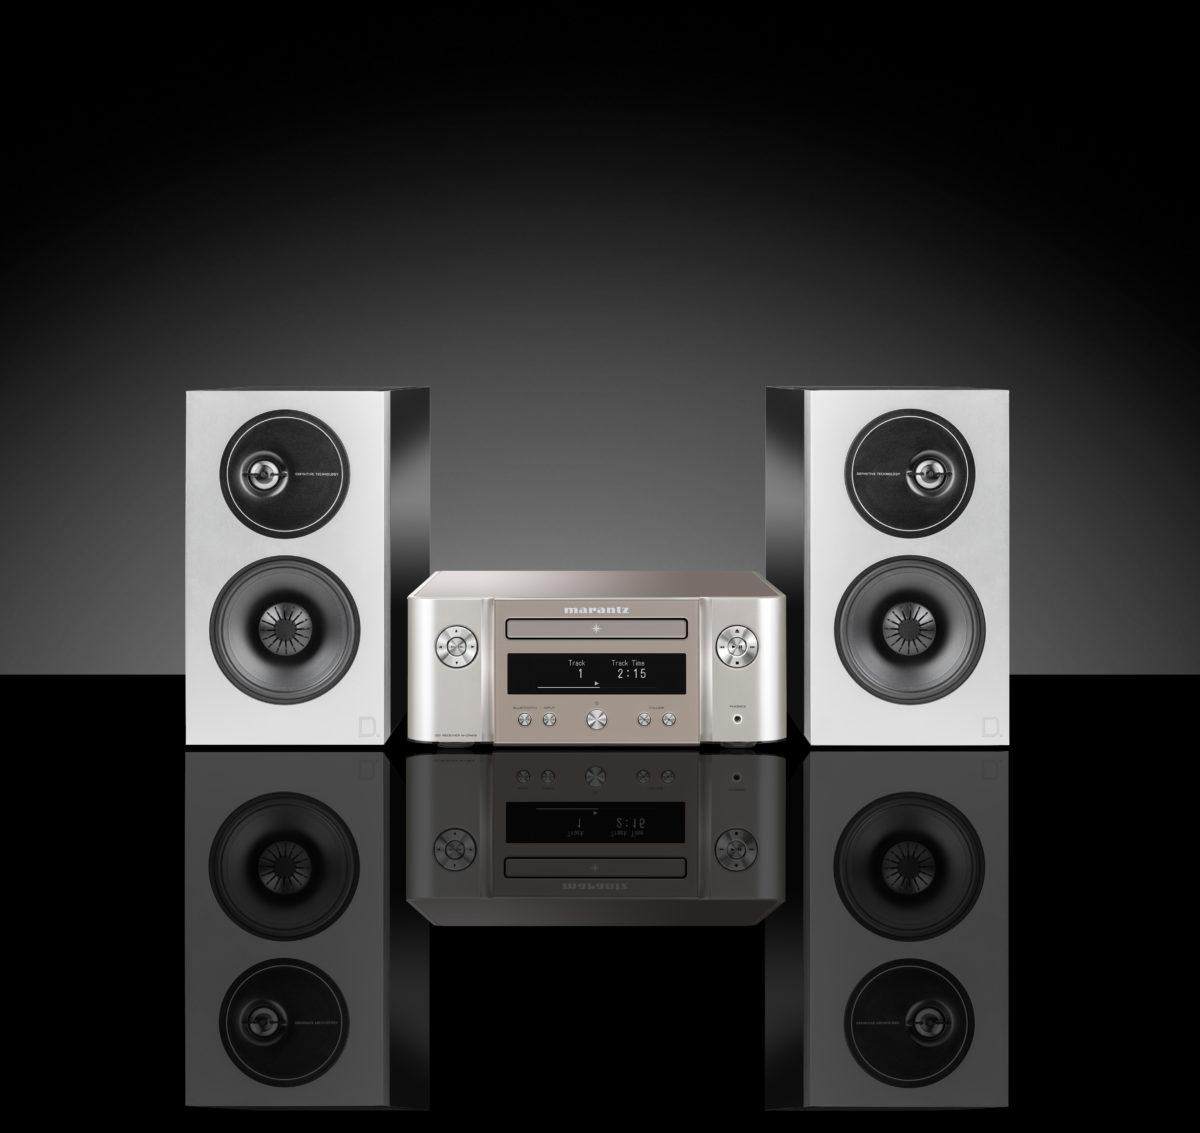 Marantz M-CR412 + Definitive Technology Demand D7 speakers